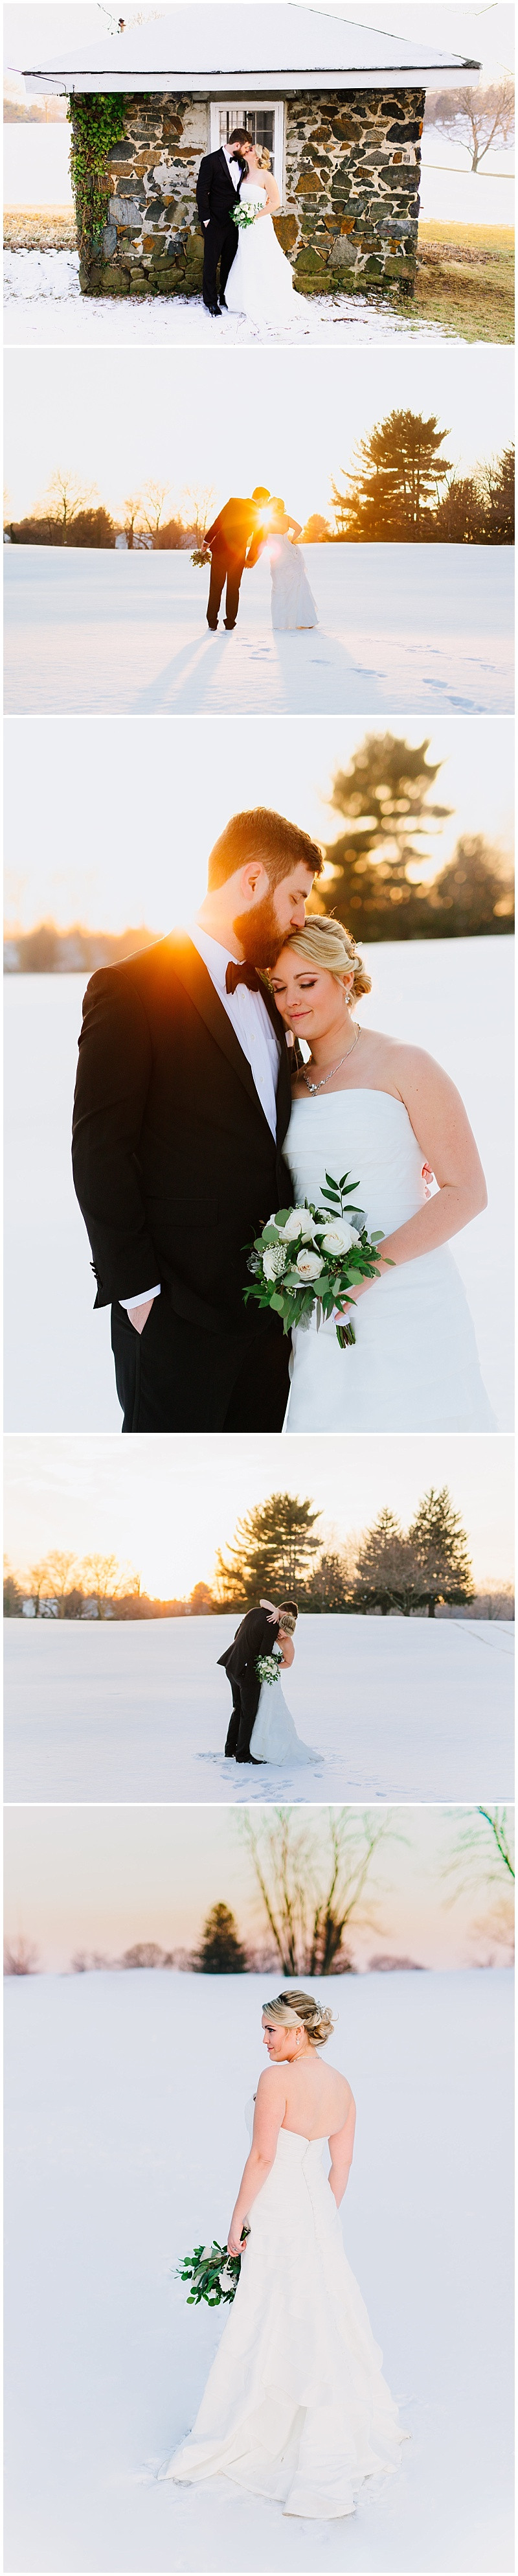 Sunset Winter Wedding Inspiration